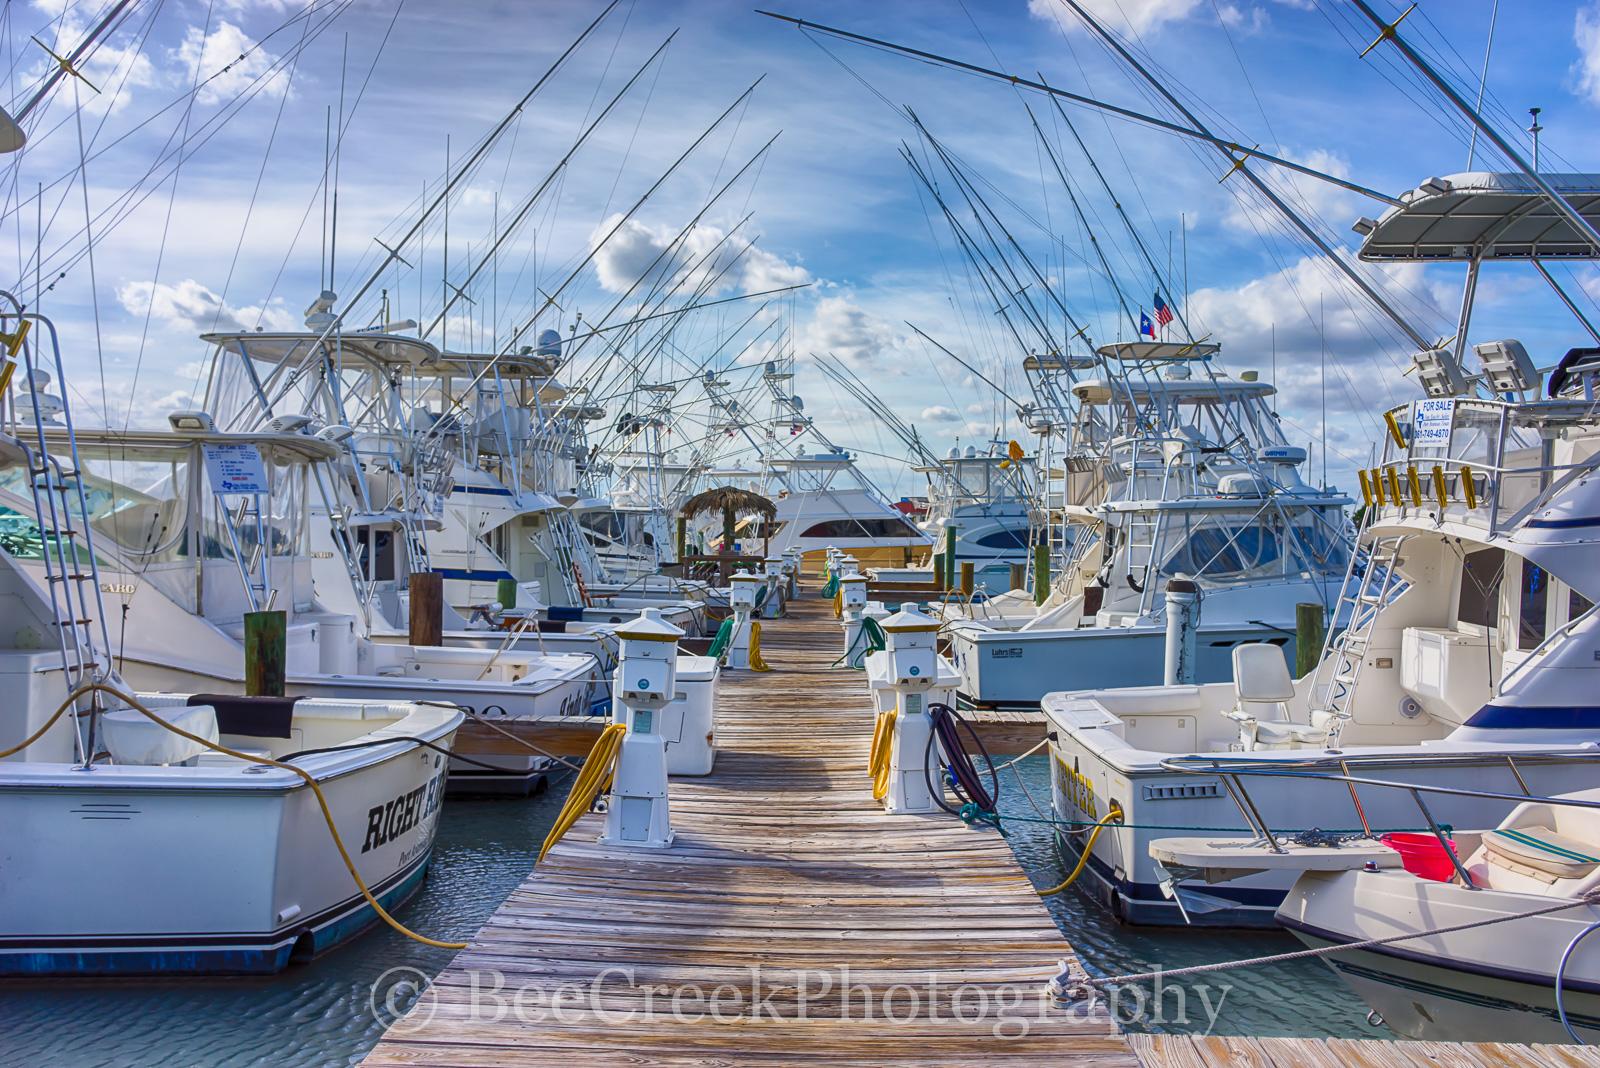 Port A, Port Aransas, Texas Coast, beach, boats, coast, coastal, fishing boats, ocean, sea, seascape, surf, texas, photo